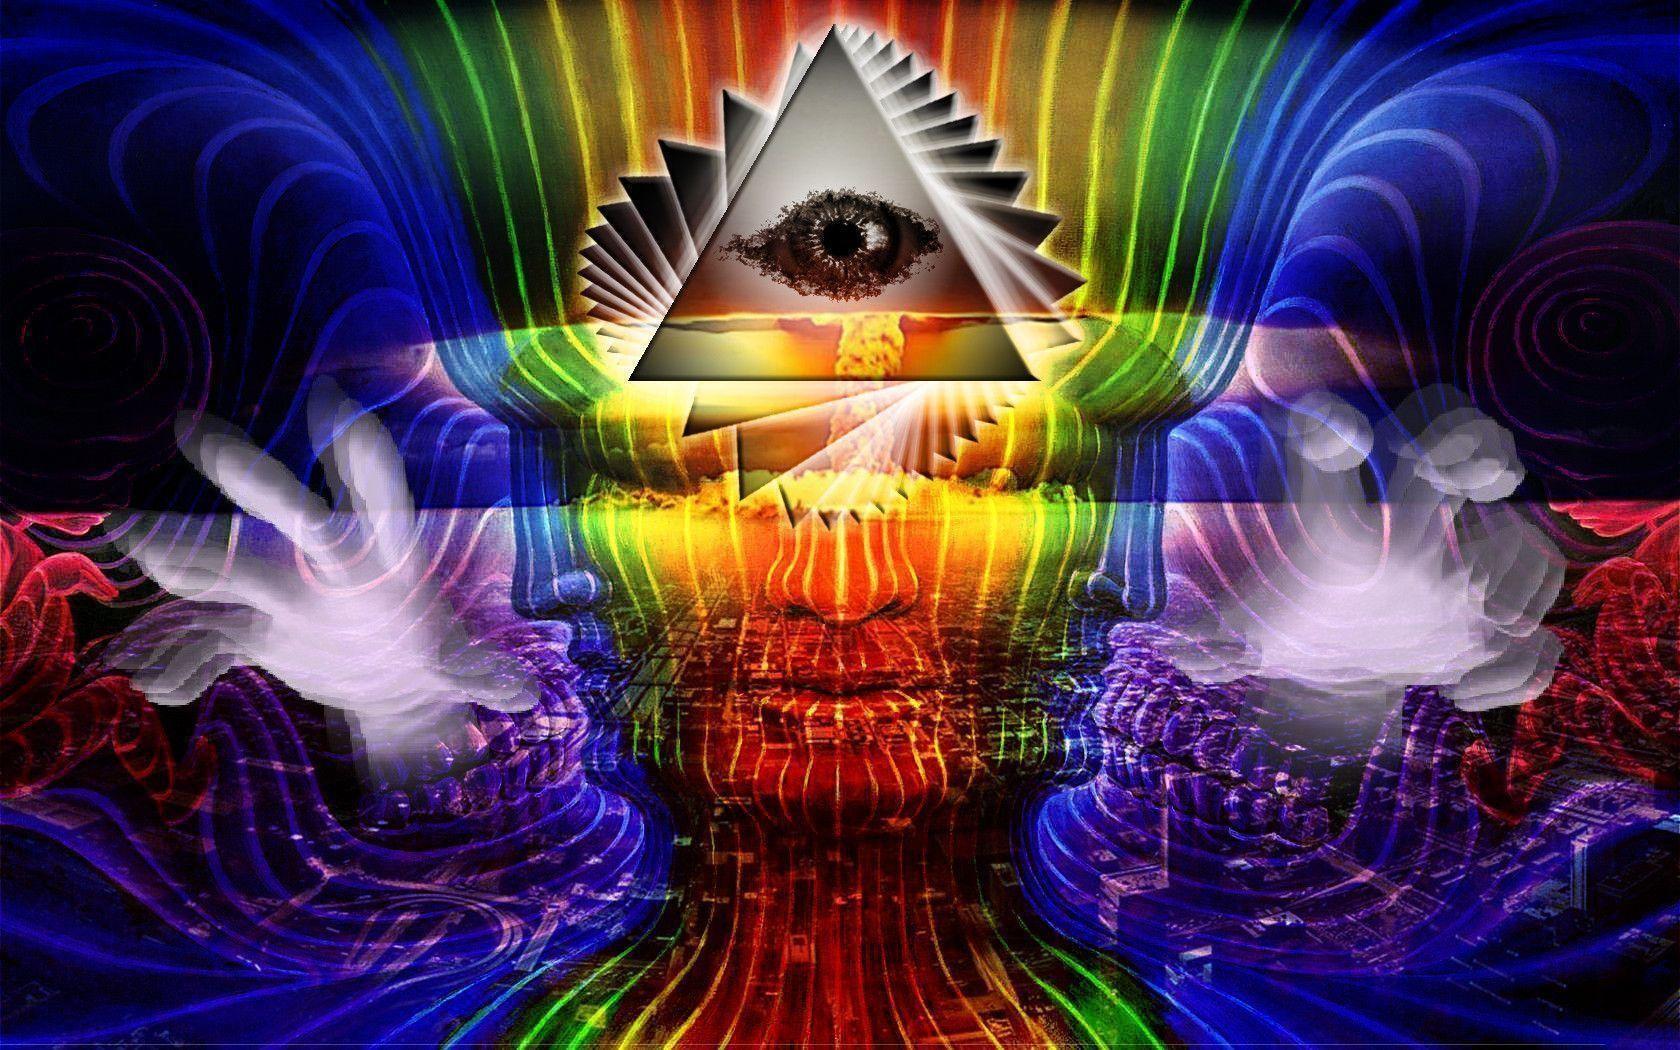 MLG Illuminati Wallpapers - Top Free MLG Illuminati Backgrounds - WallpaperAccess